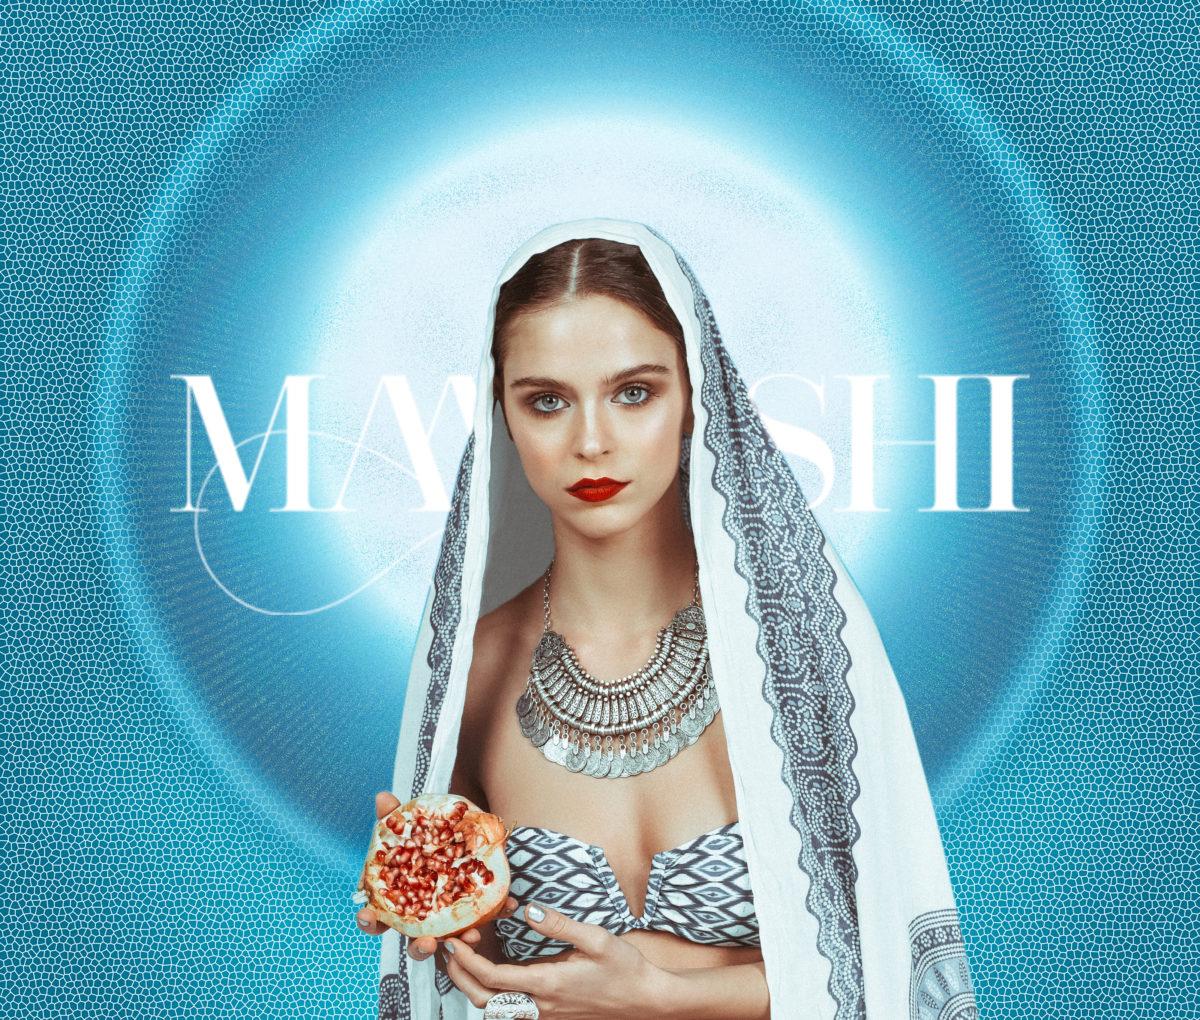 Maafushi cover